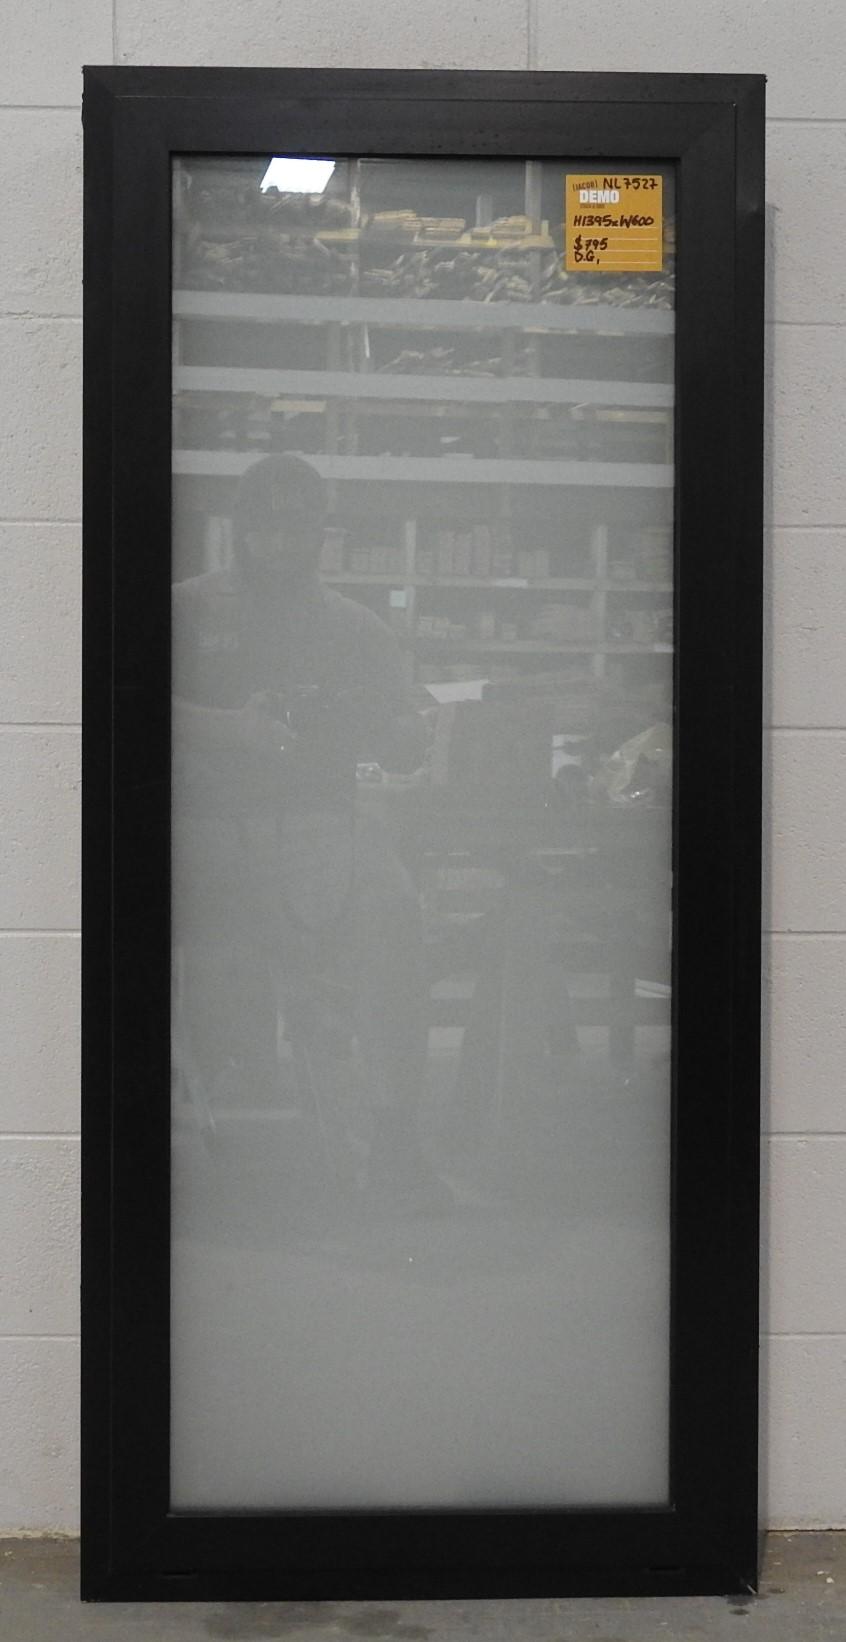 Black Aluminium double glazed awning window - near new